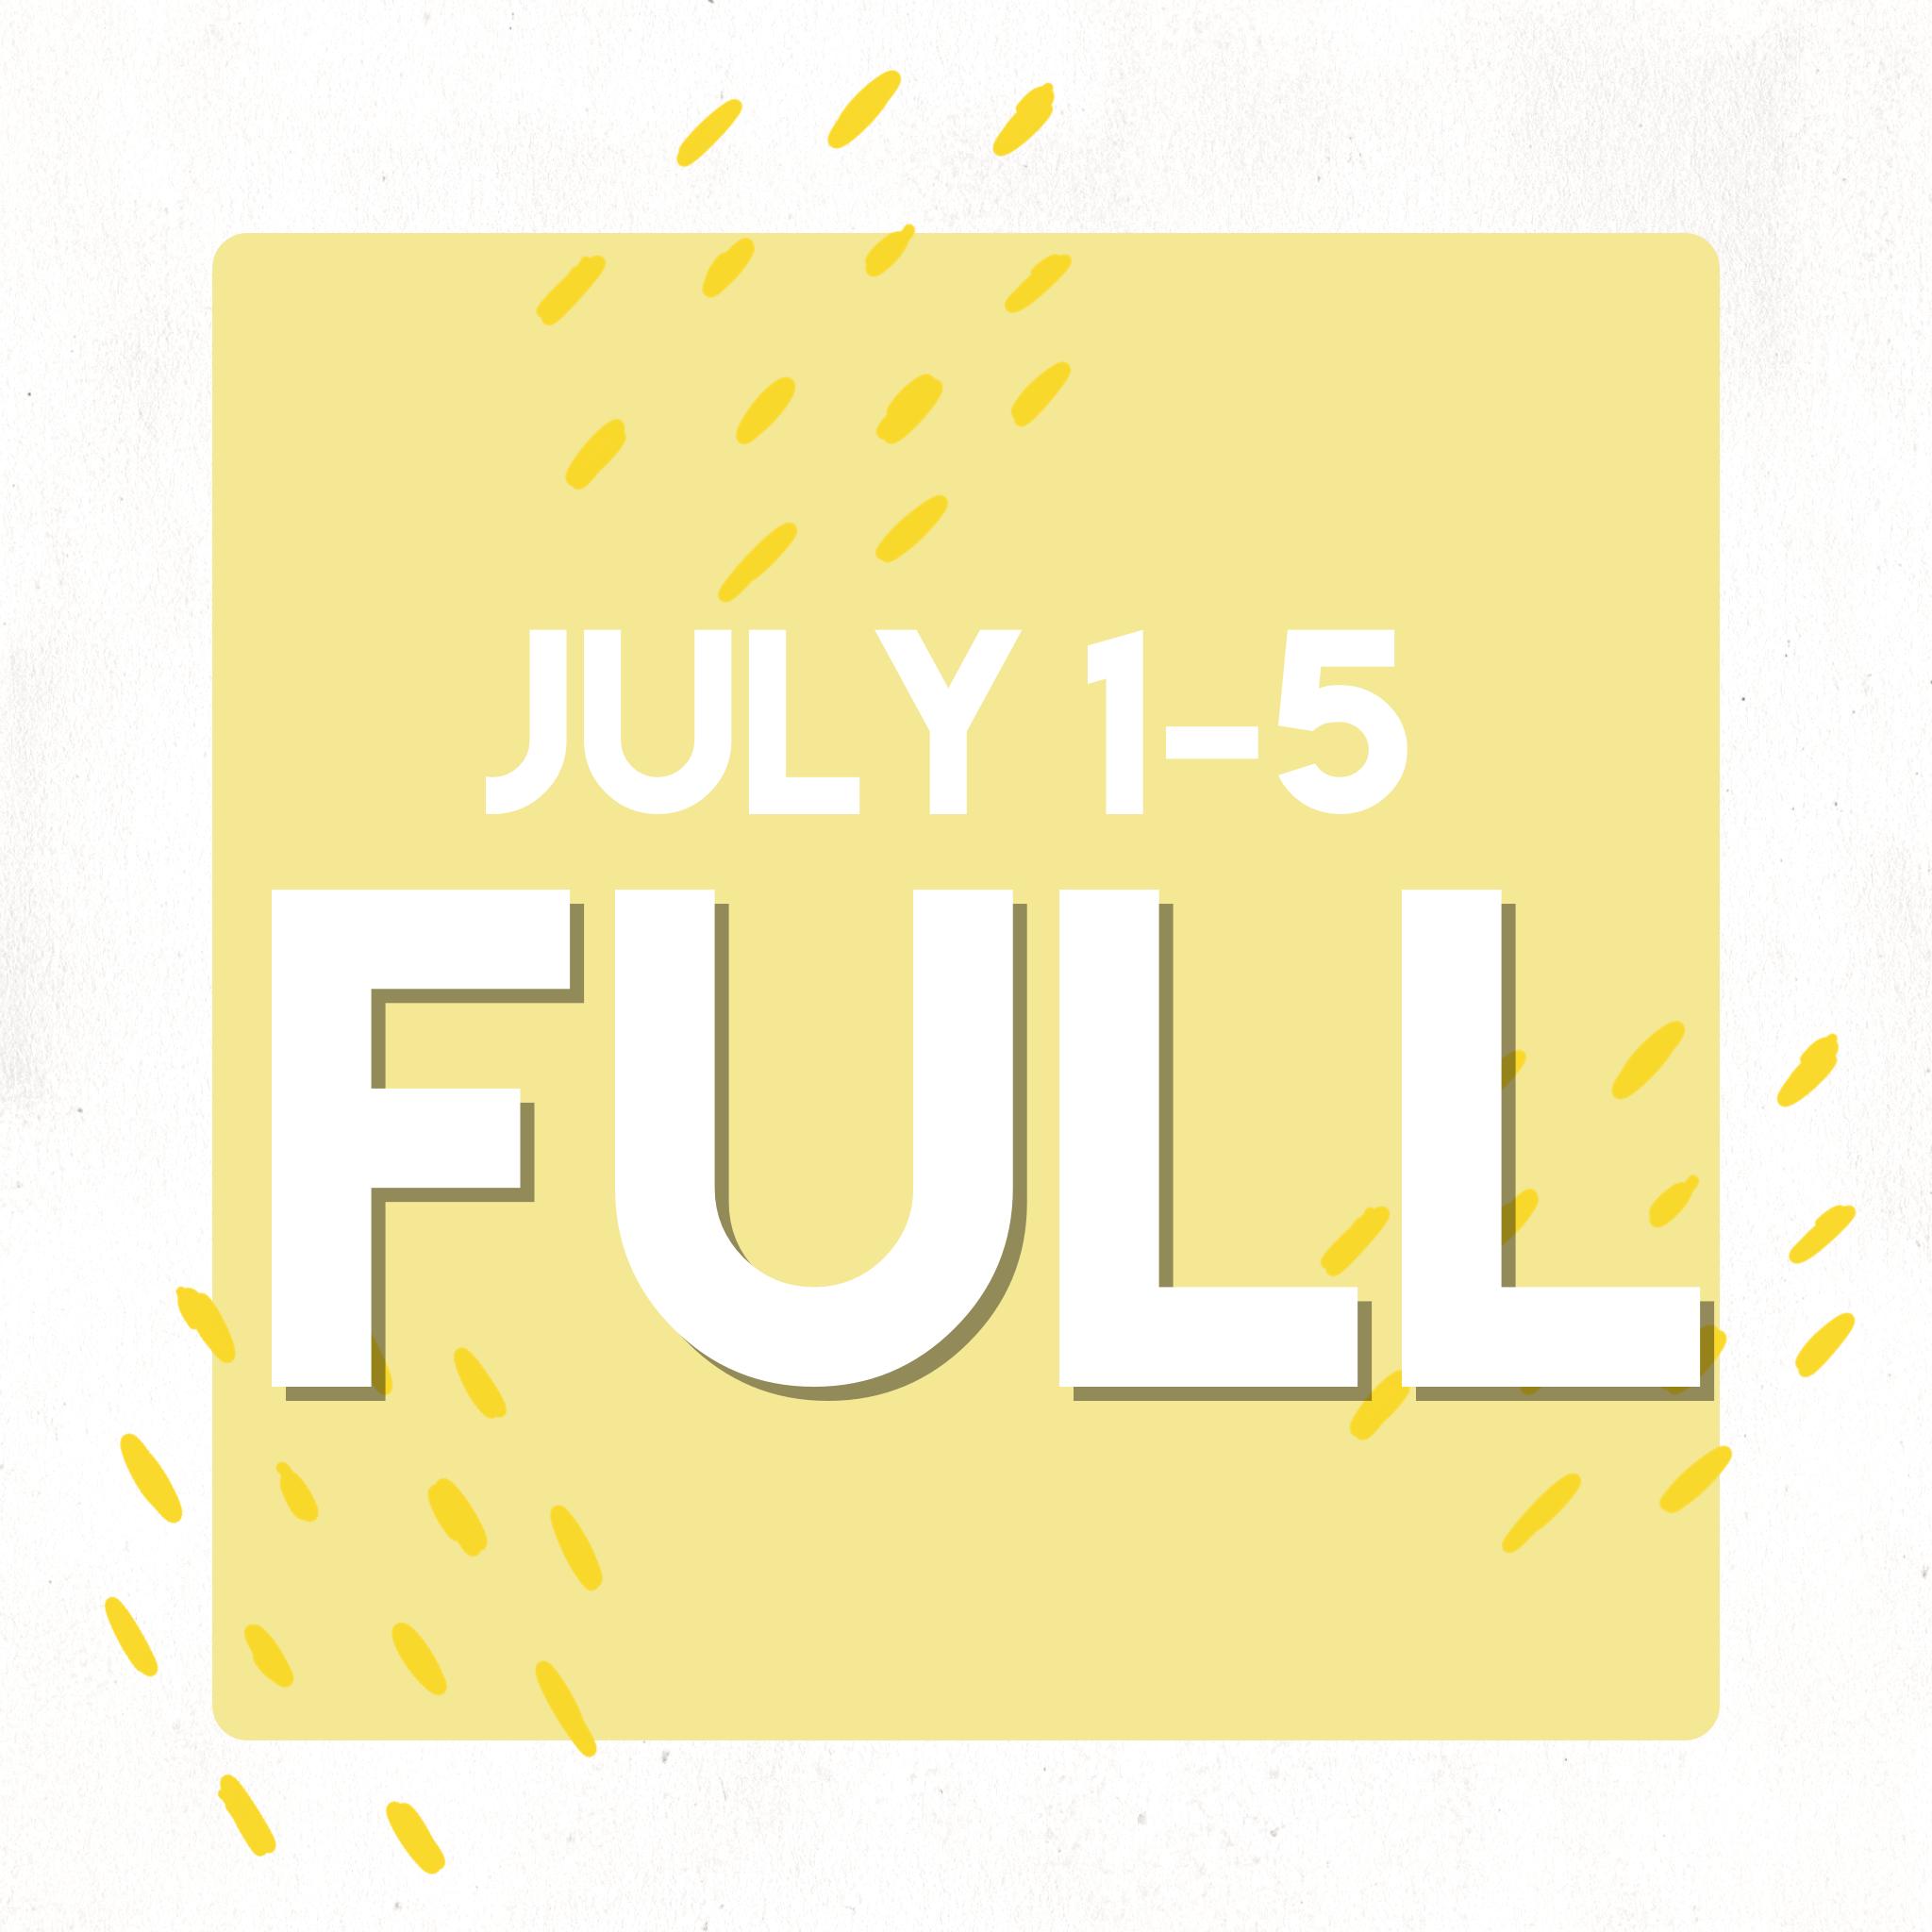 July 1-5 WIND (No camp July 4) (FULL) -